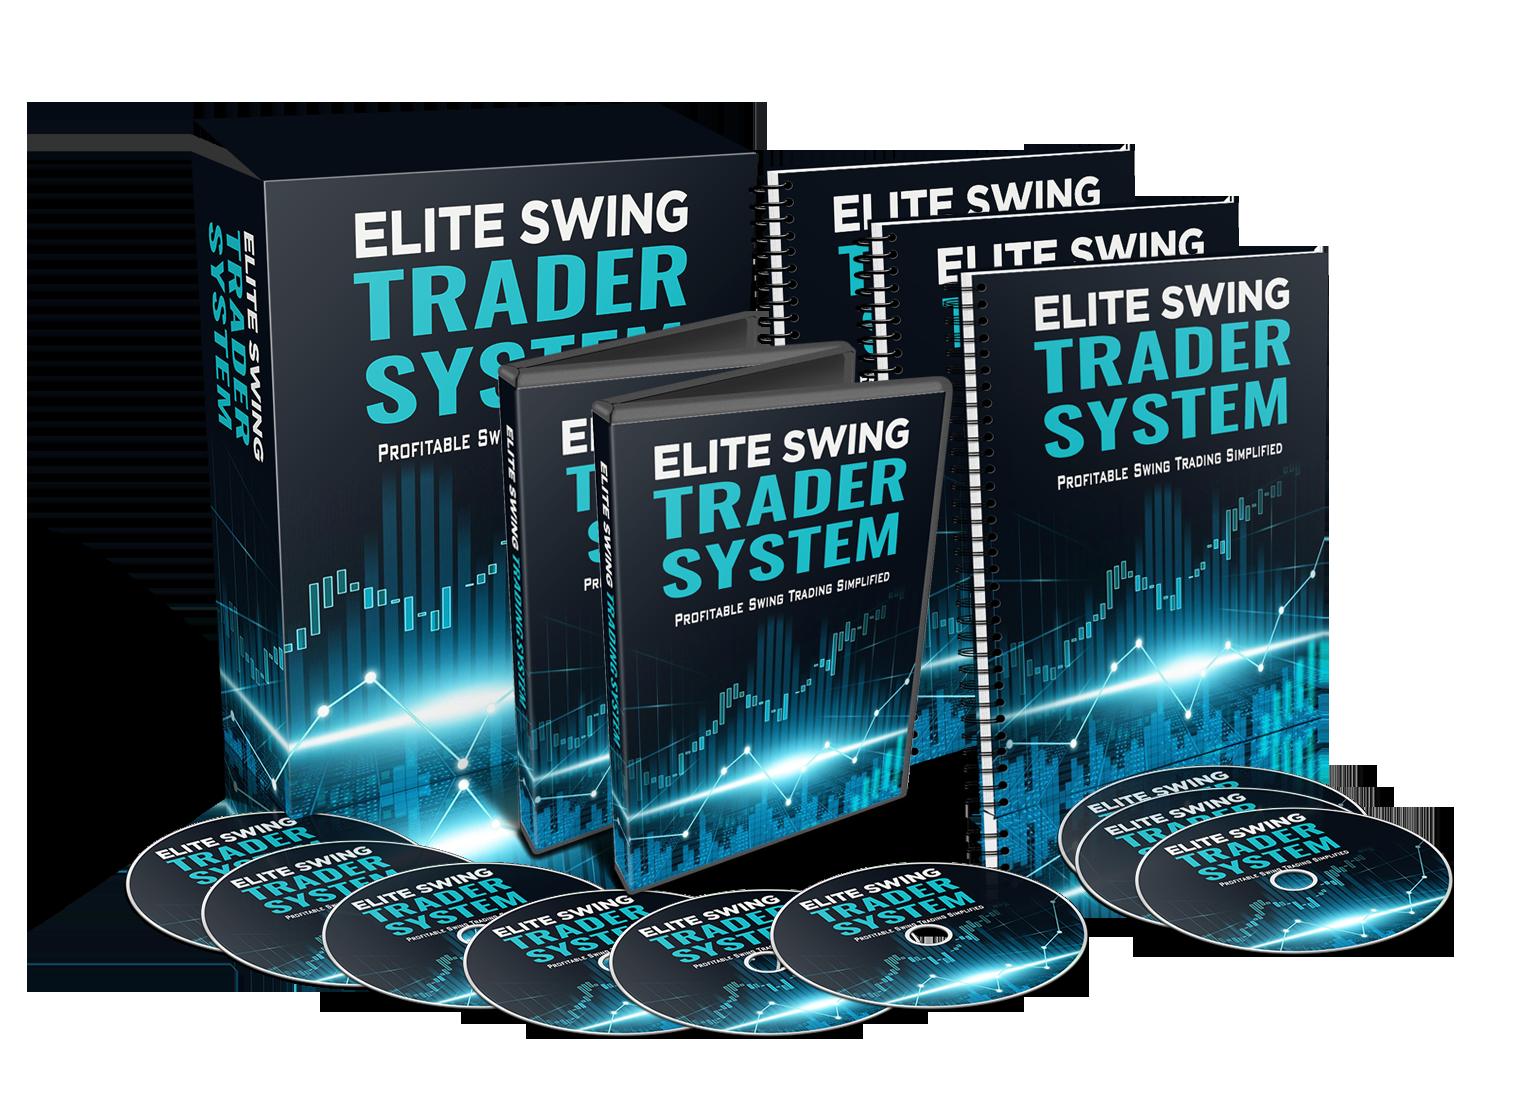 [GET] Elite Swing Trader – Profitable Swing Trading Simplified Download